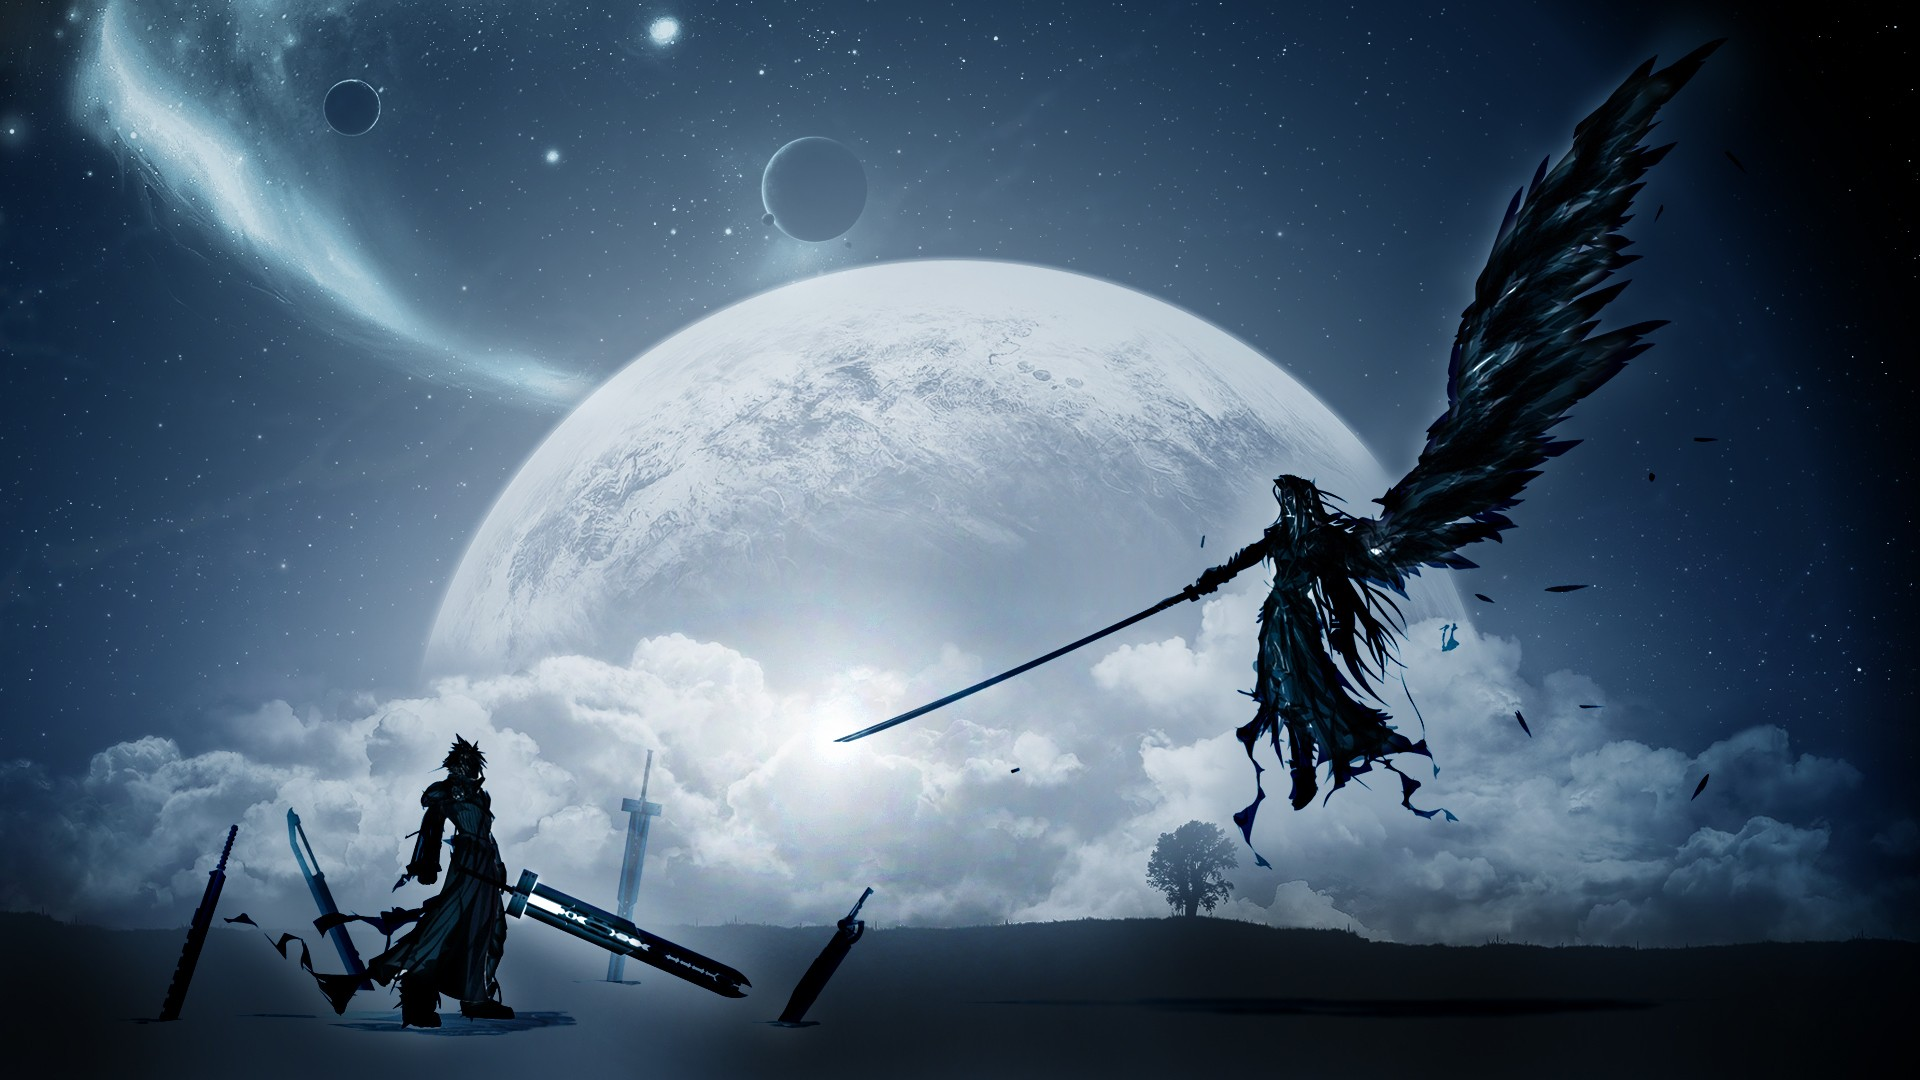 General 1920x1080 Sephiroth Cloud Strife video games Final Fantasy VII Final Fantasy VII: Advent Children